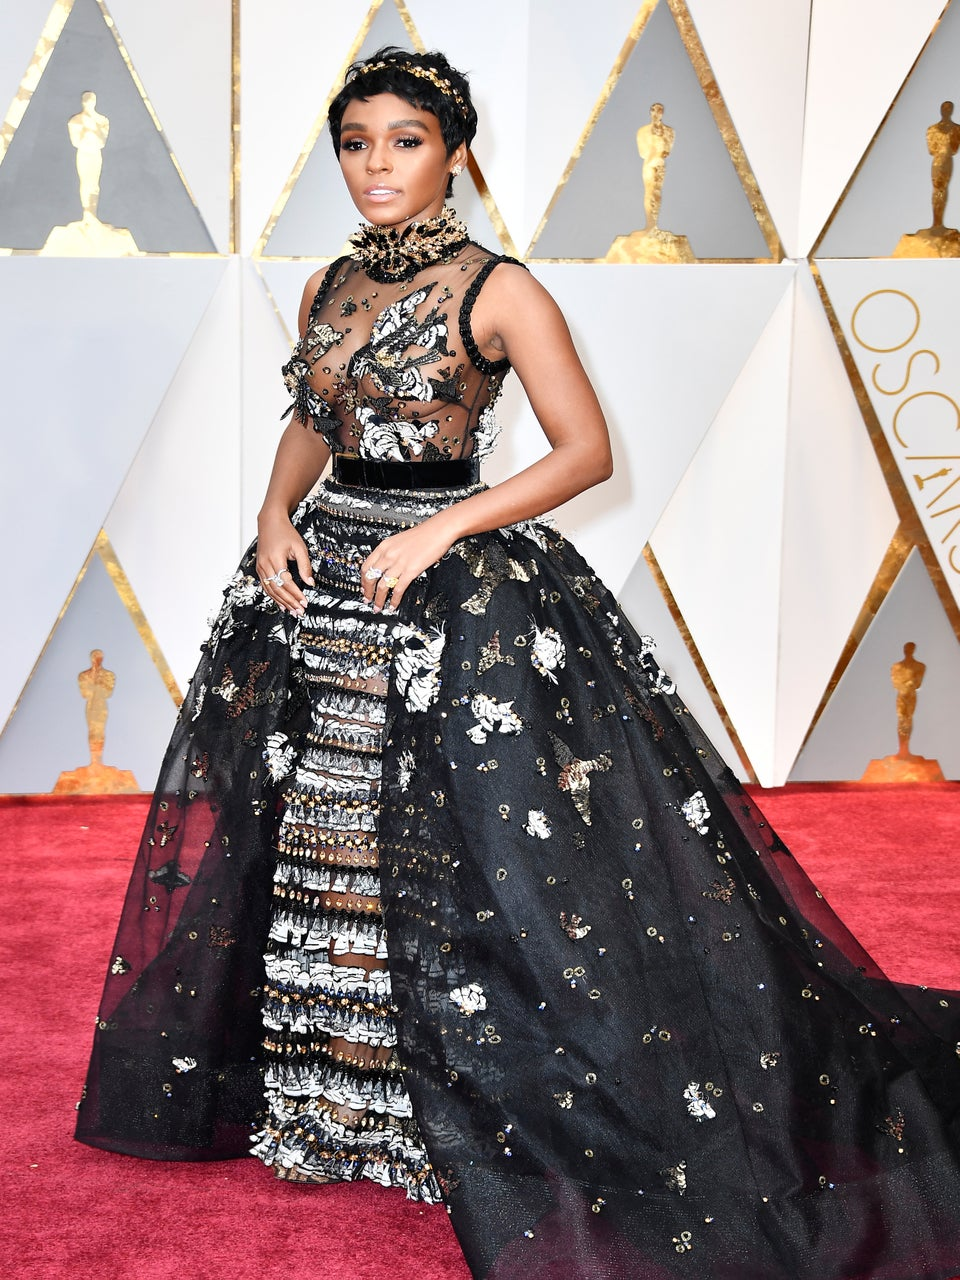 Janelle Monae Looks Like Royalty on 2017 Oscars Red Carpet